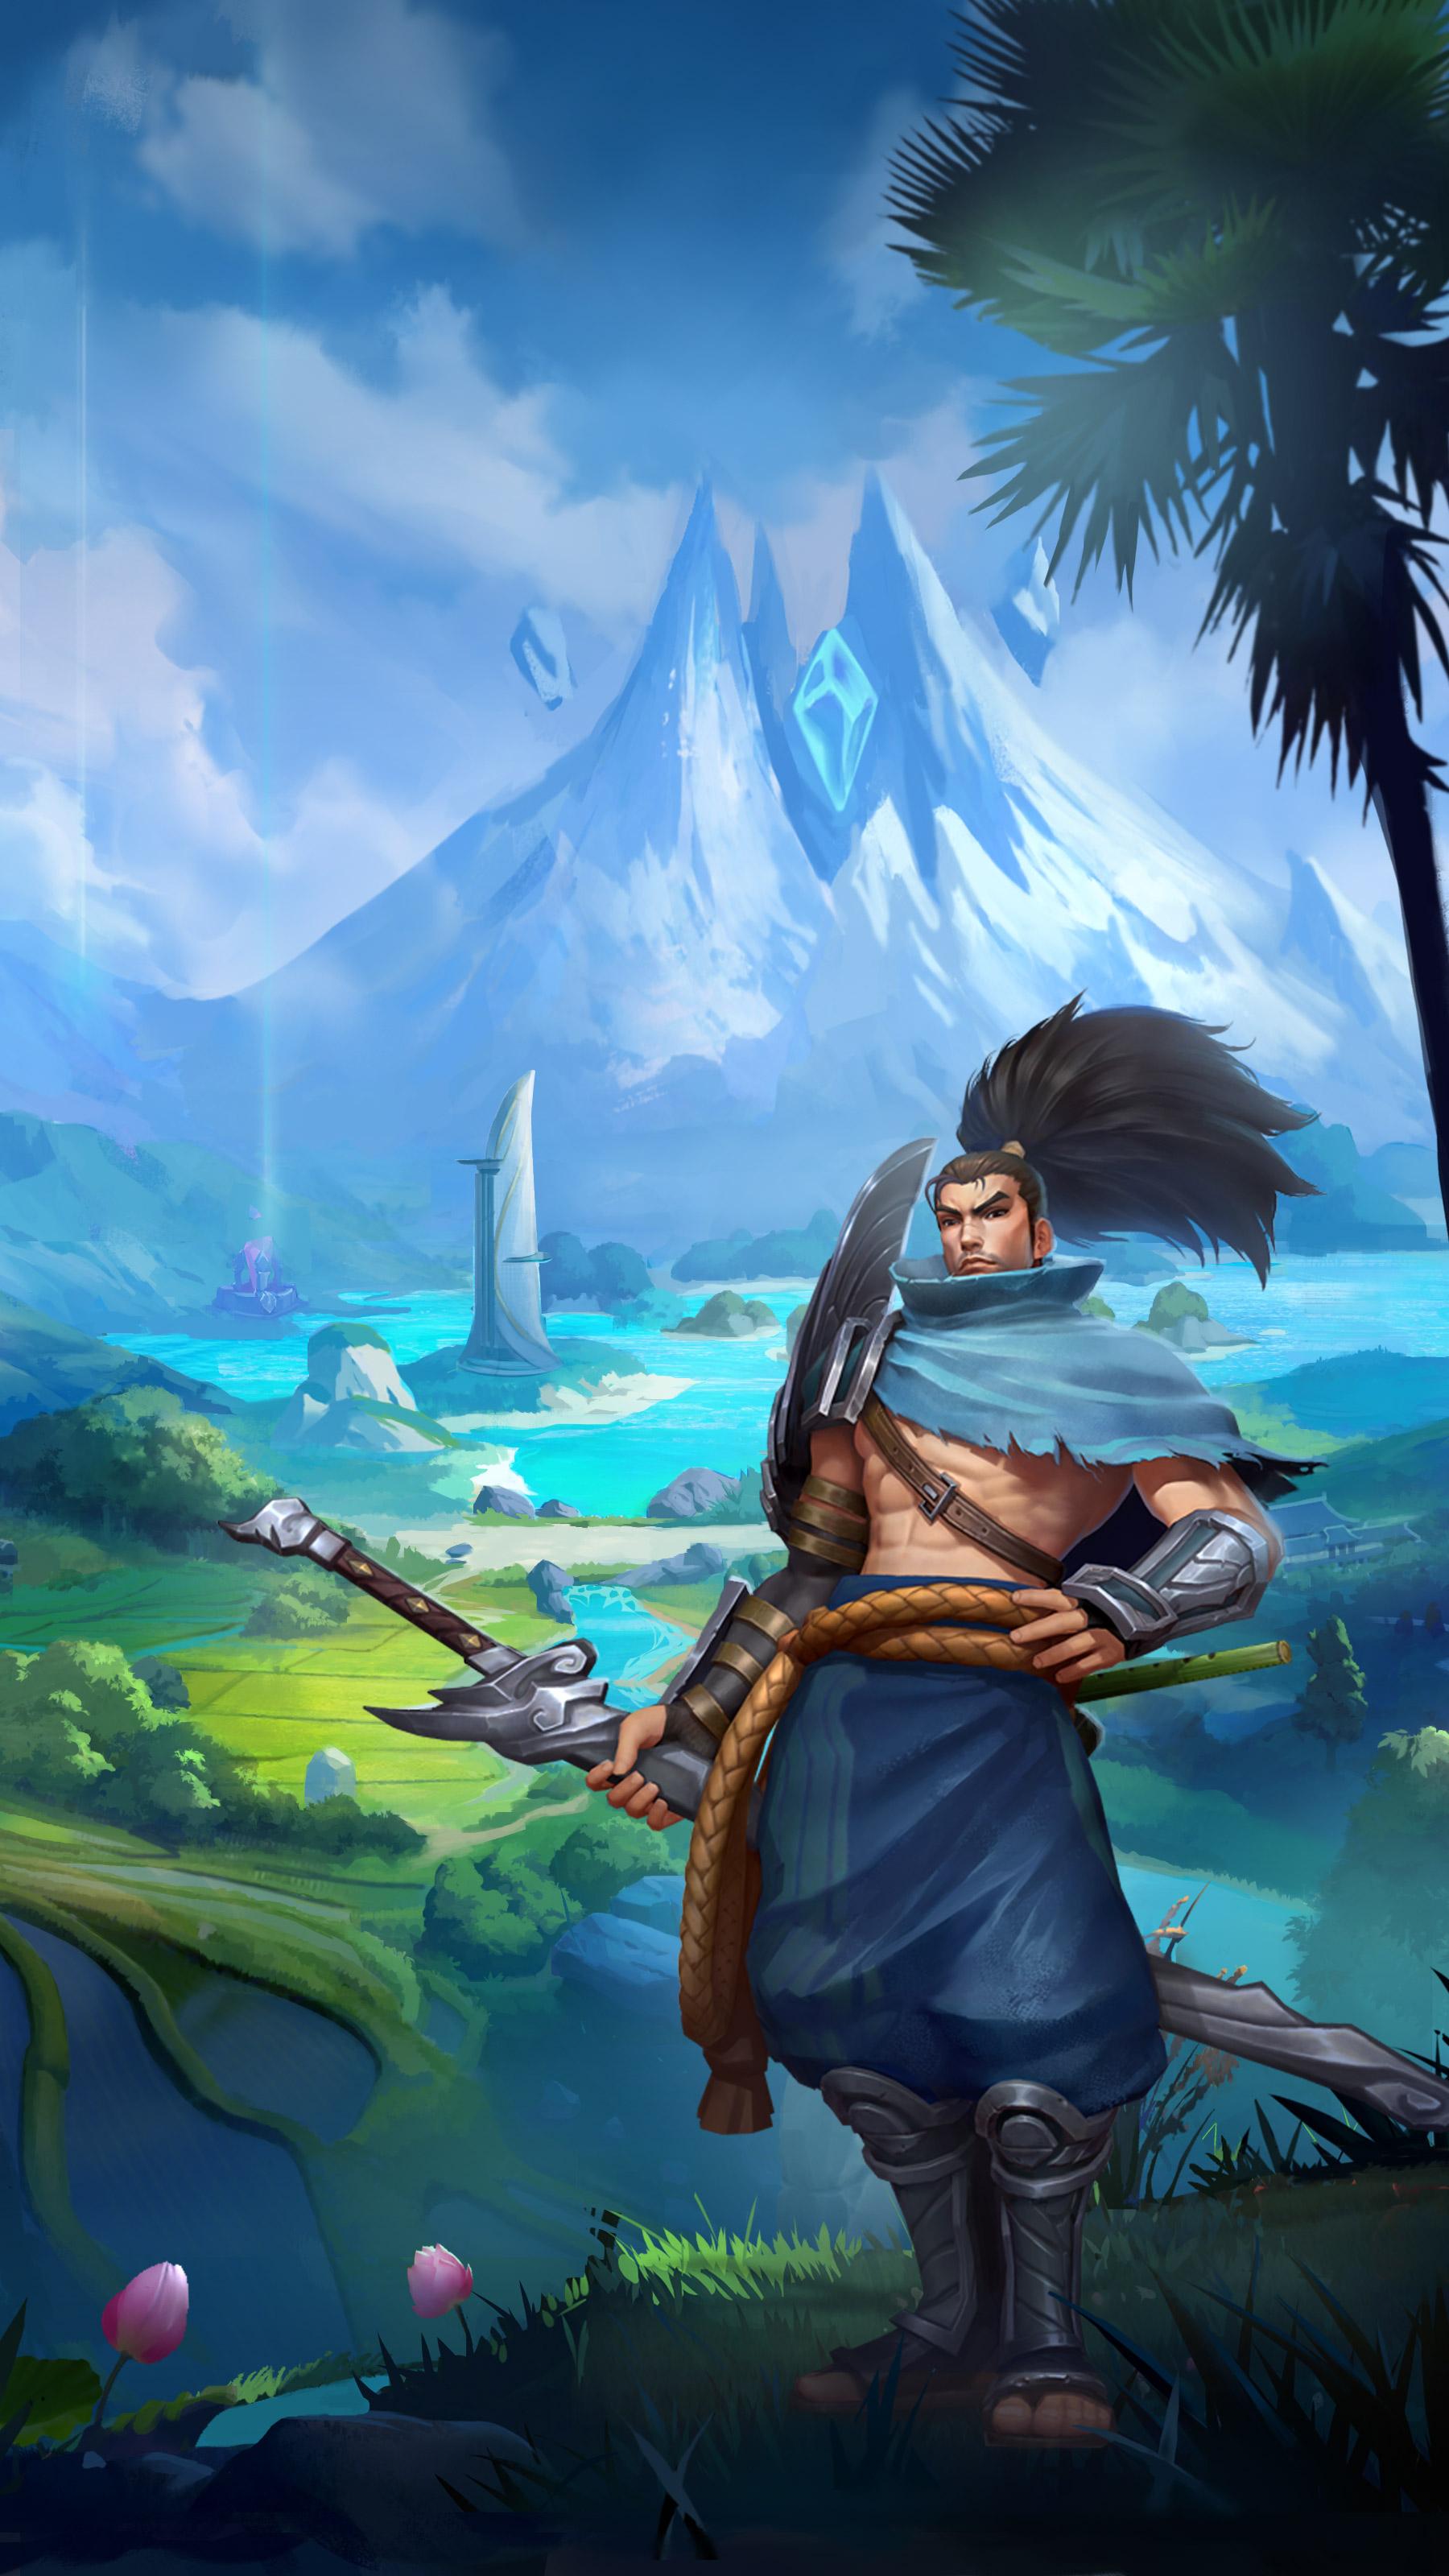 15+ Wallpaper League of Legends: Wild Rift Untuk PC dan Hp 3